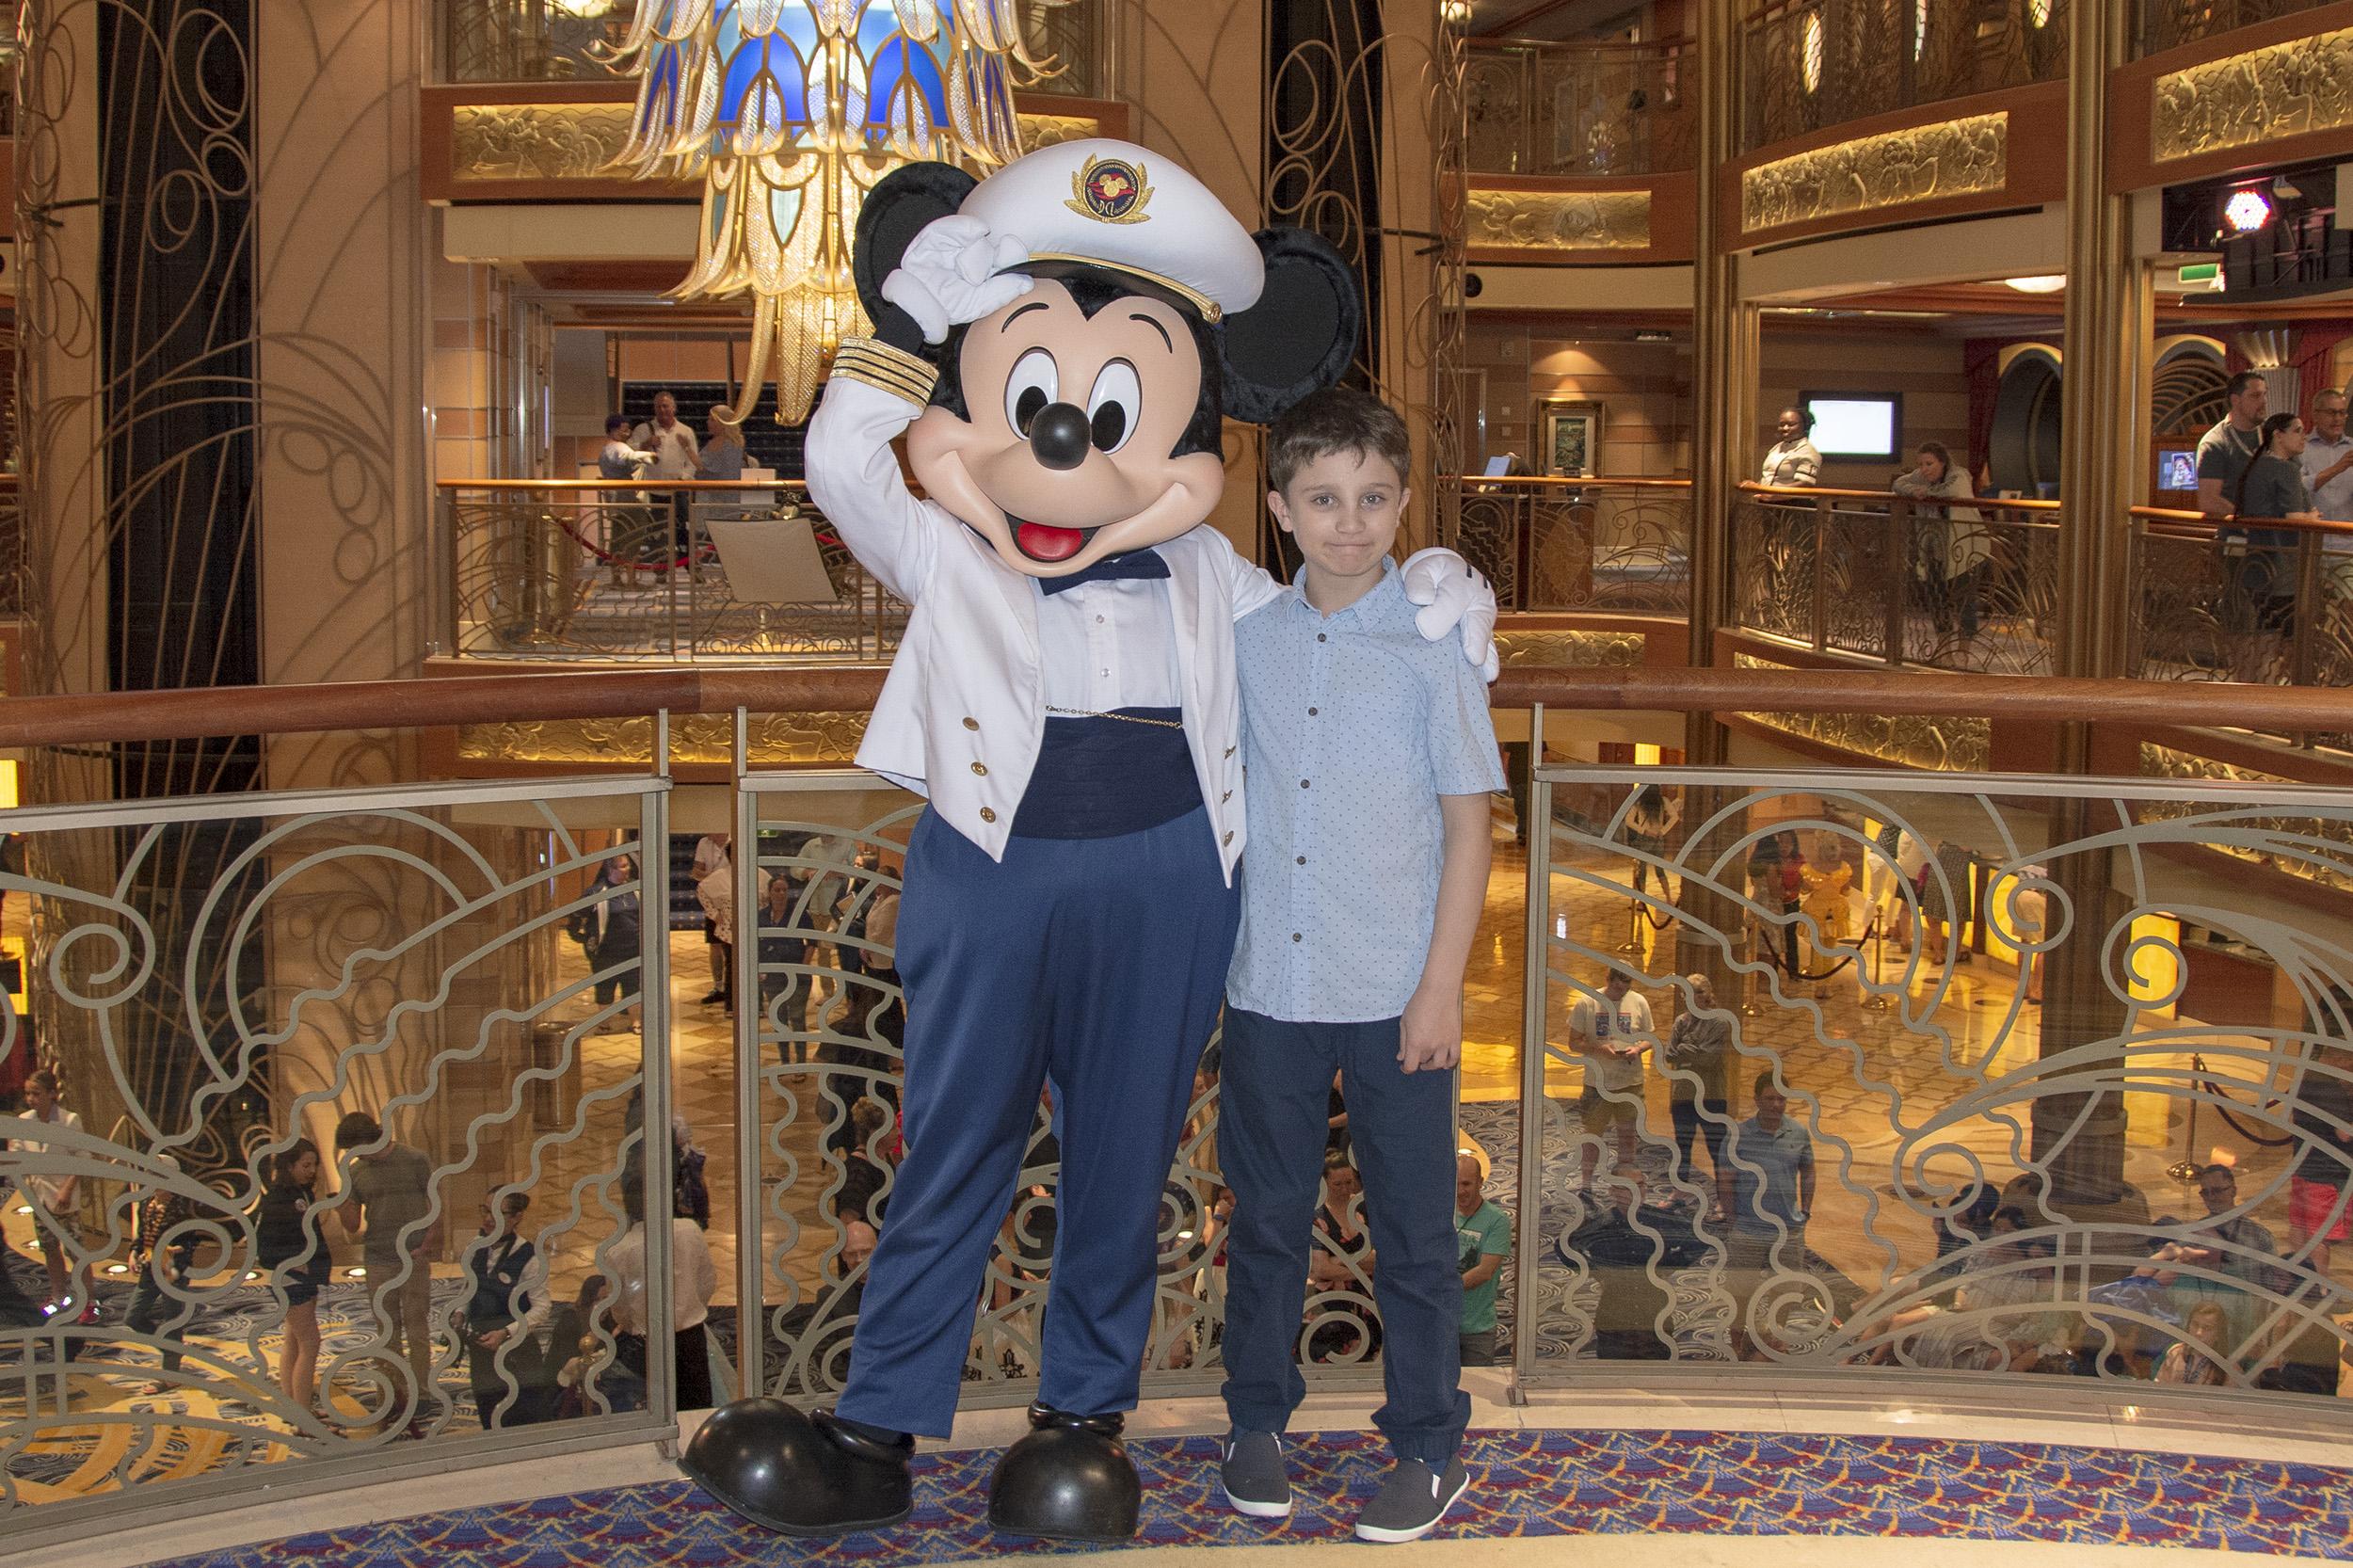 Disney Dream Captain Mickey Mouse